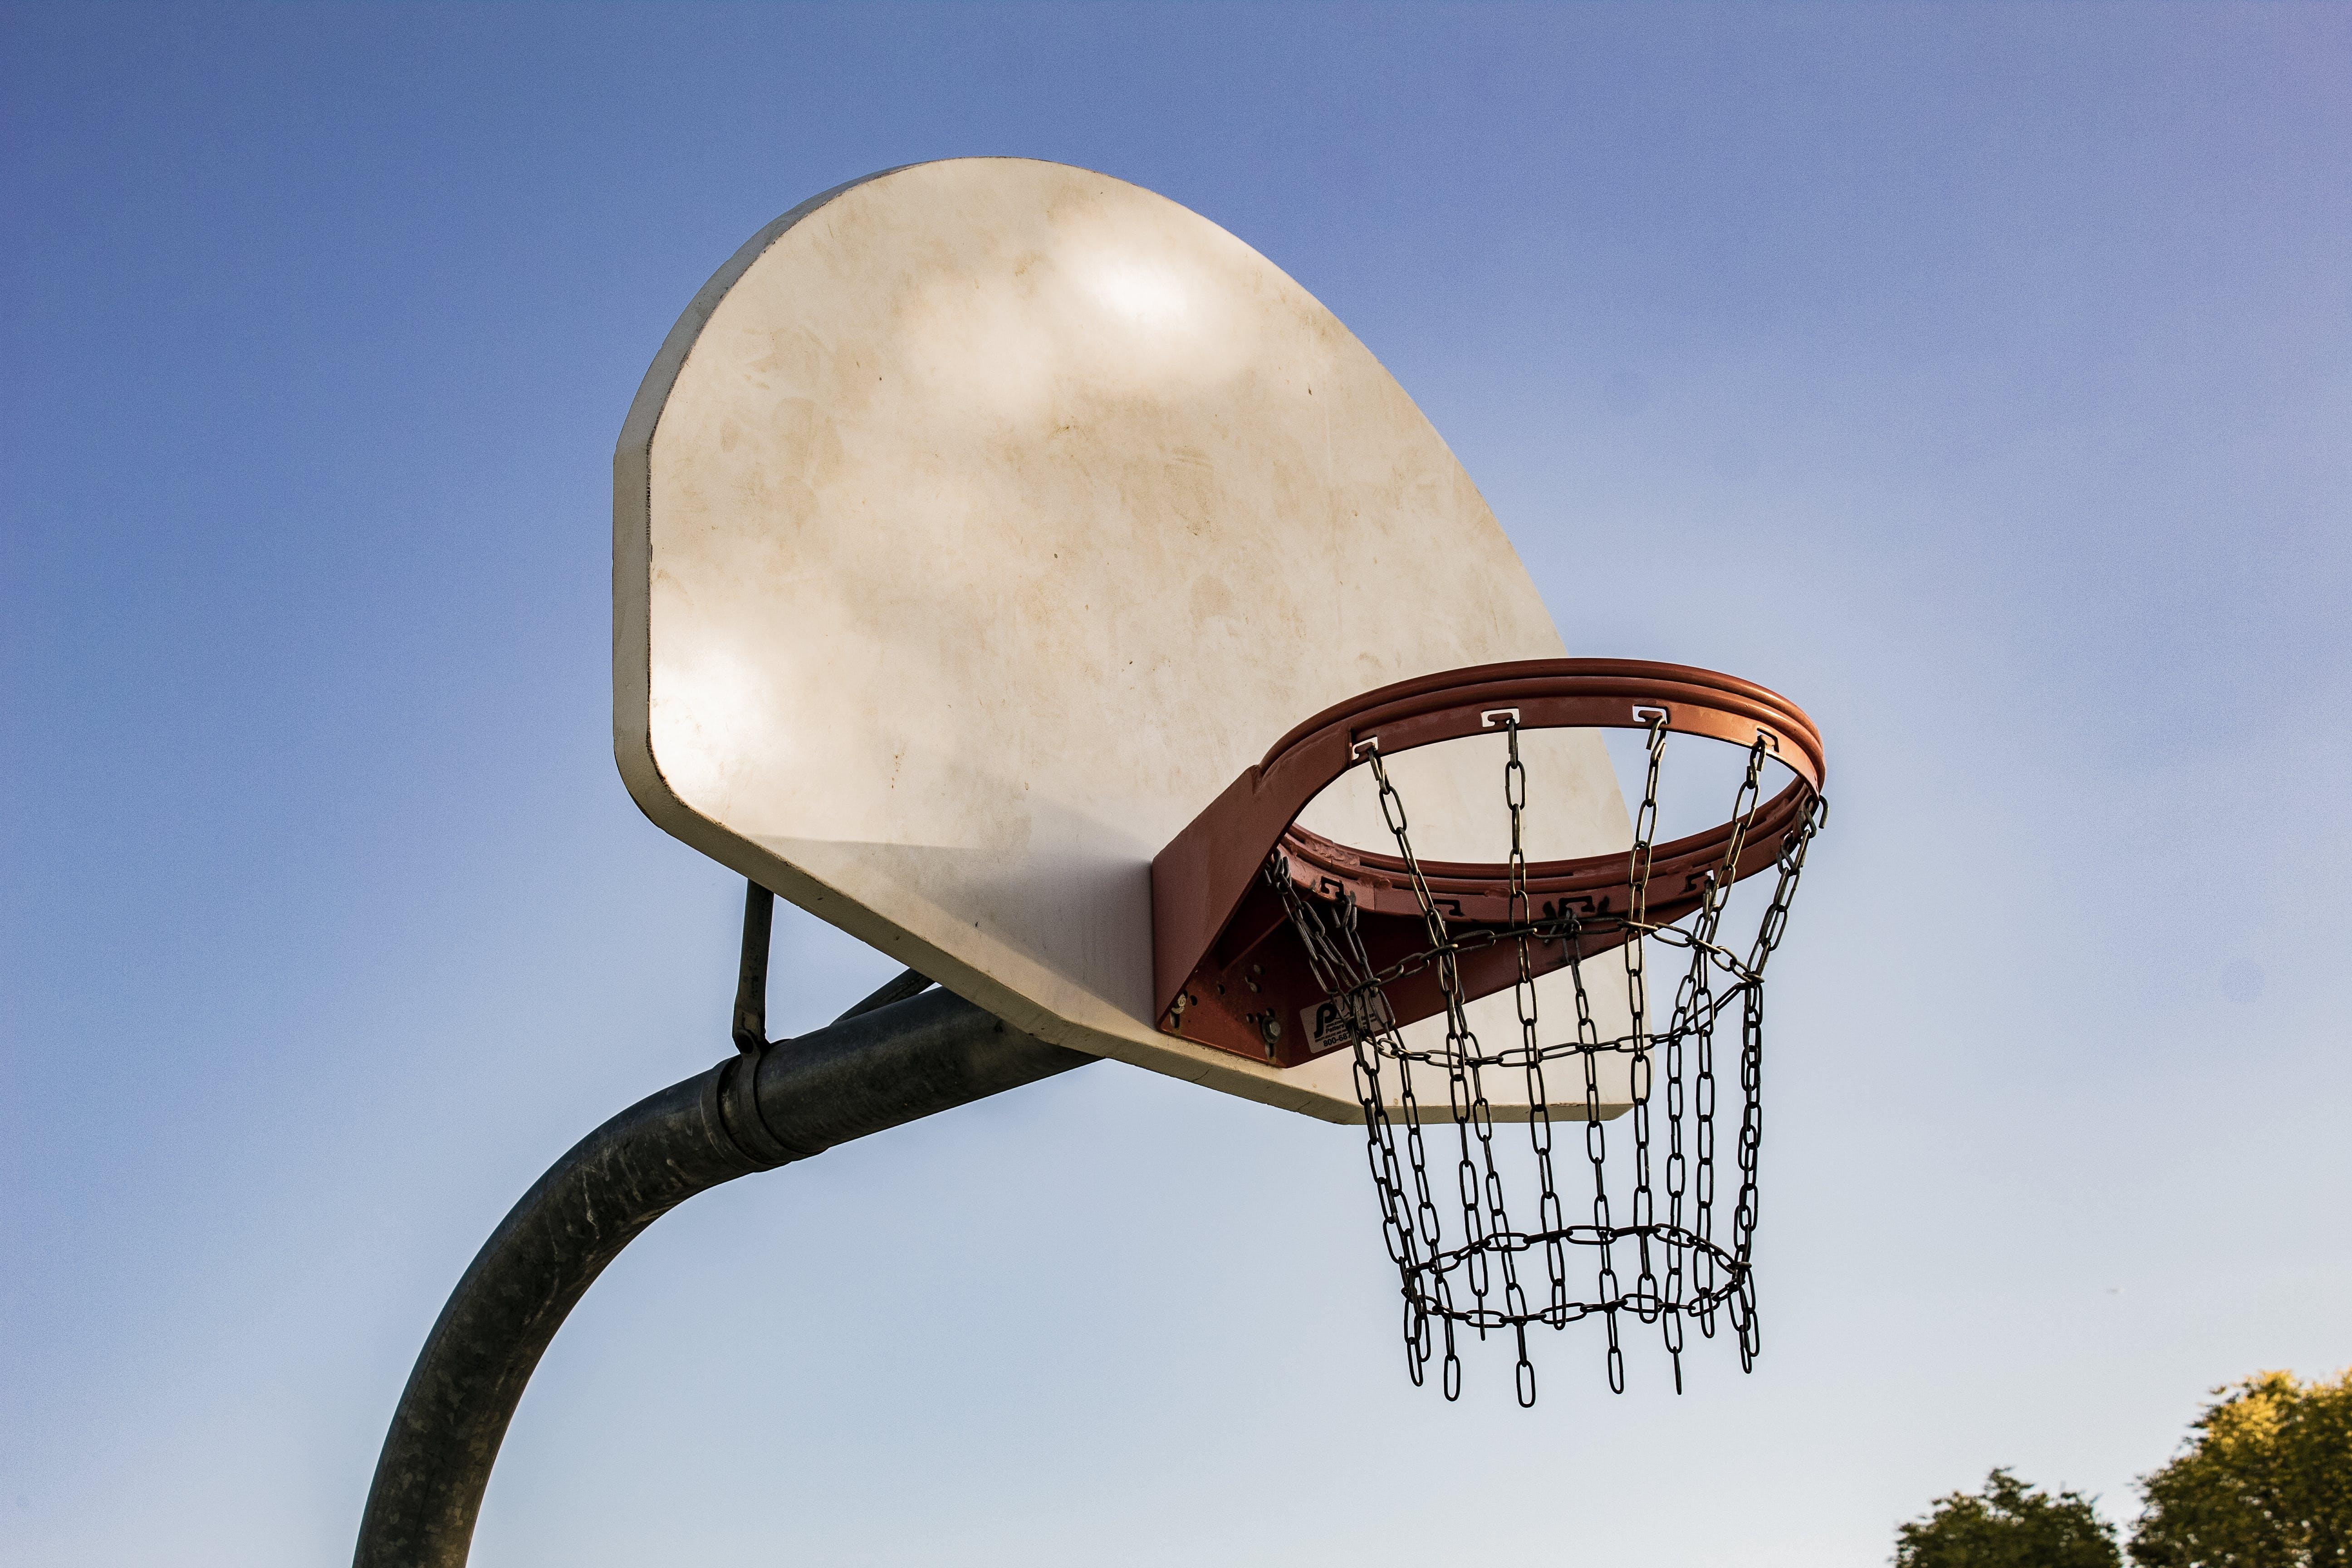 Basketball Hoops Under Clear Blue Sky